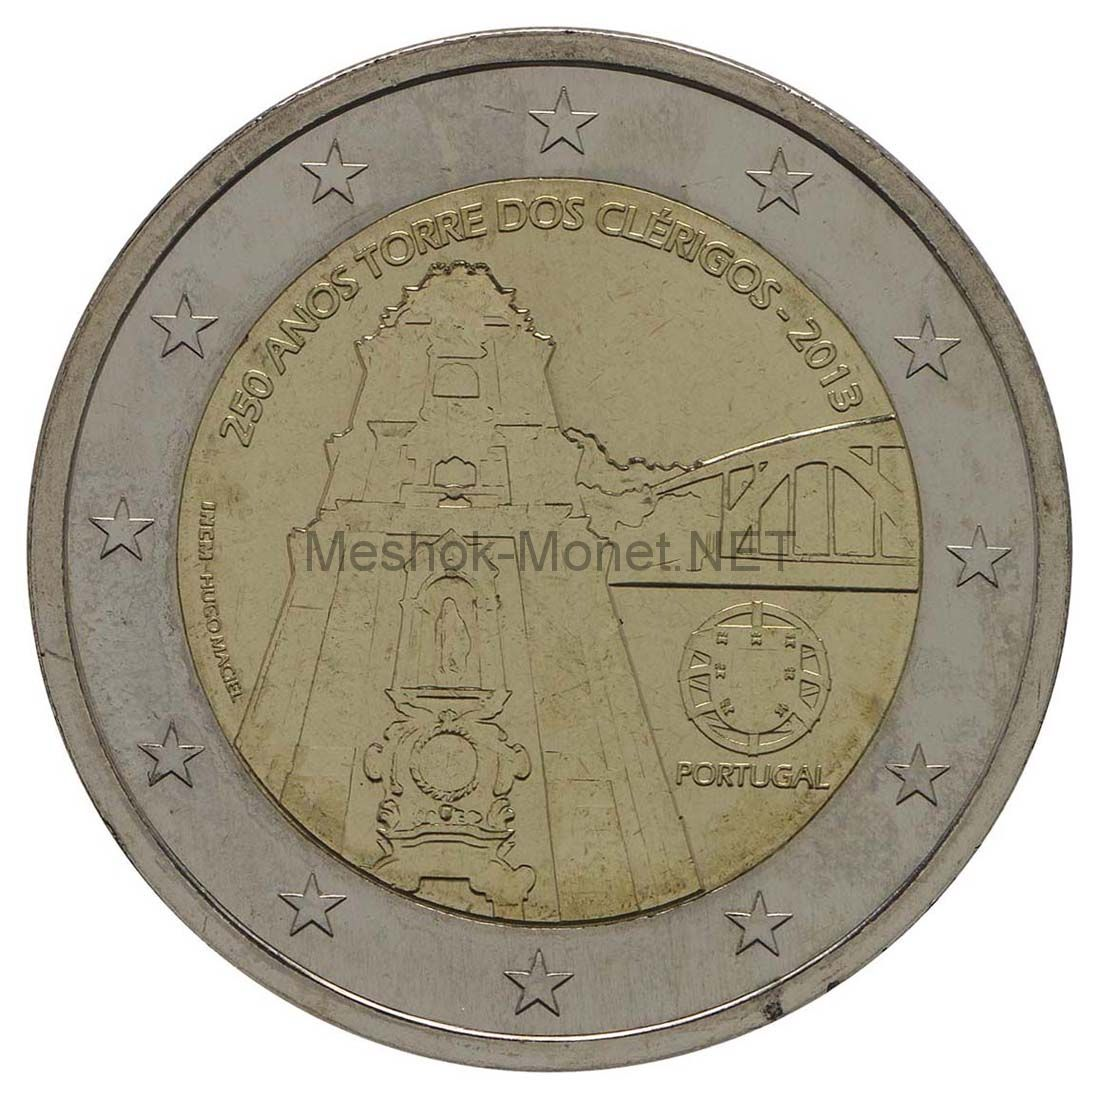 Португалия 2 евро 2013, 250 лет башне Клеригуш